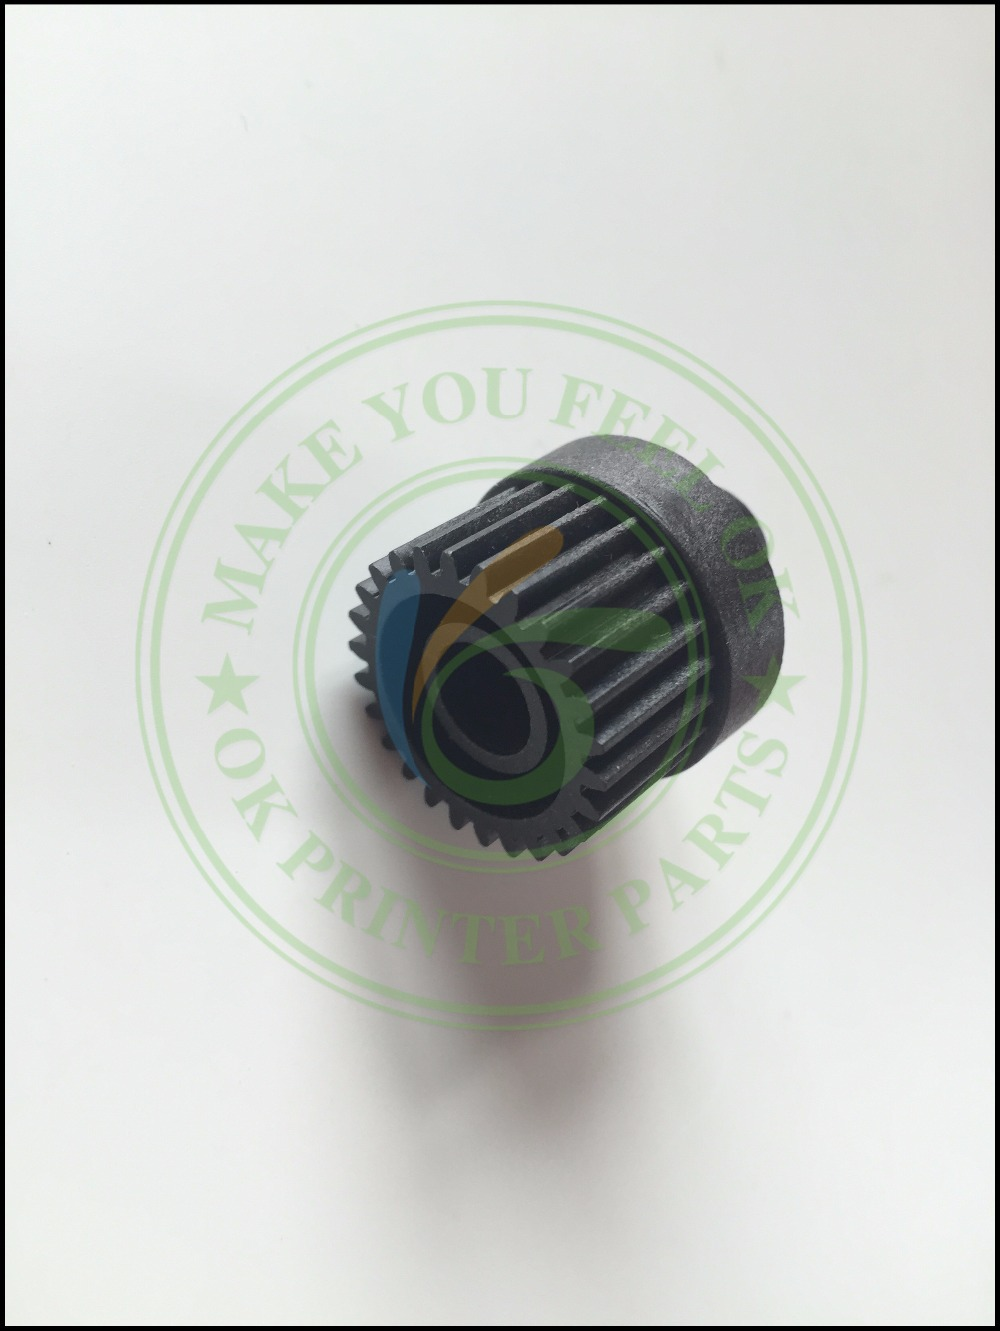 10PCX ORIGINAL JC66-01202A Fuser Inner Drive Gear for Samsung ML1915 ML2525 ML2580 ML2540 ML2545 SCX4200 SCX4300 SCX4600 SCX4623 original for samsung scx 4200 4200 4100 4300 4116 4216 fuser assembly jc96 03891c jc96 03891a on sale